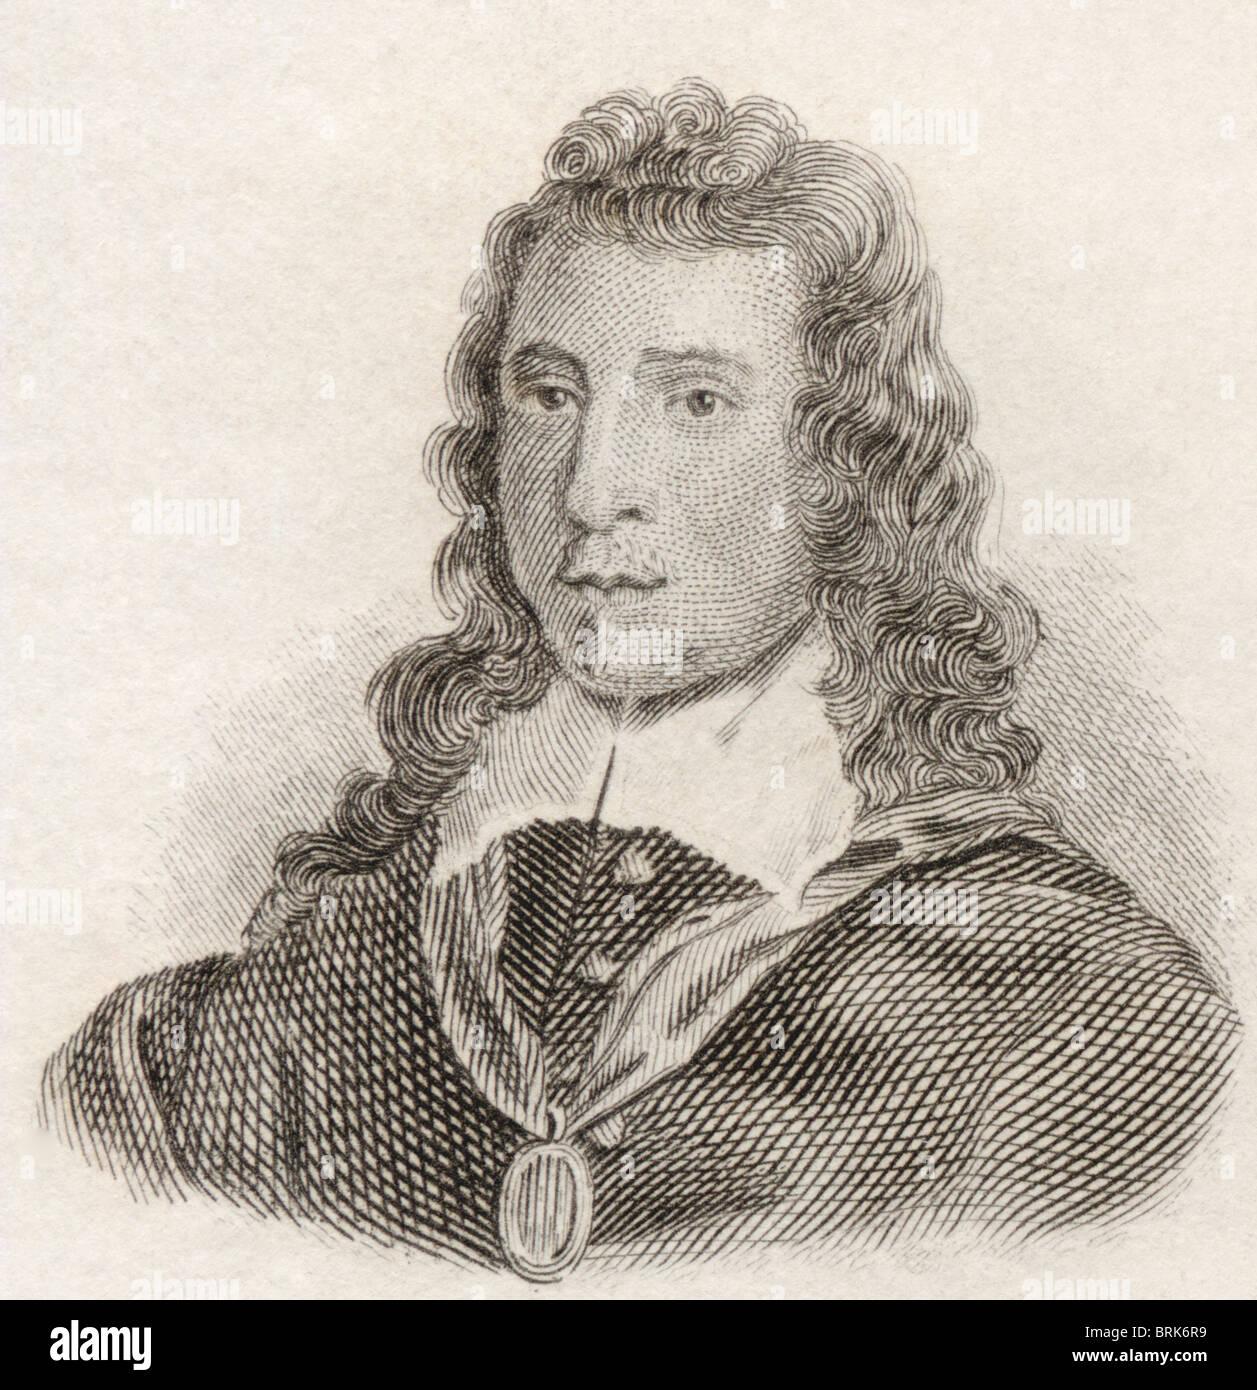 Sir John Denham, 1615 to 1669. English poet and courtier. - Stock Image